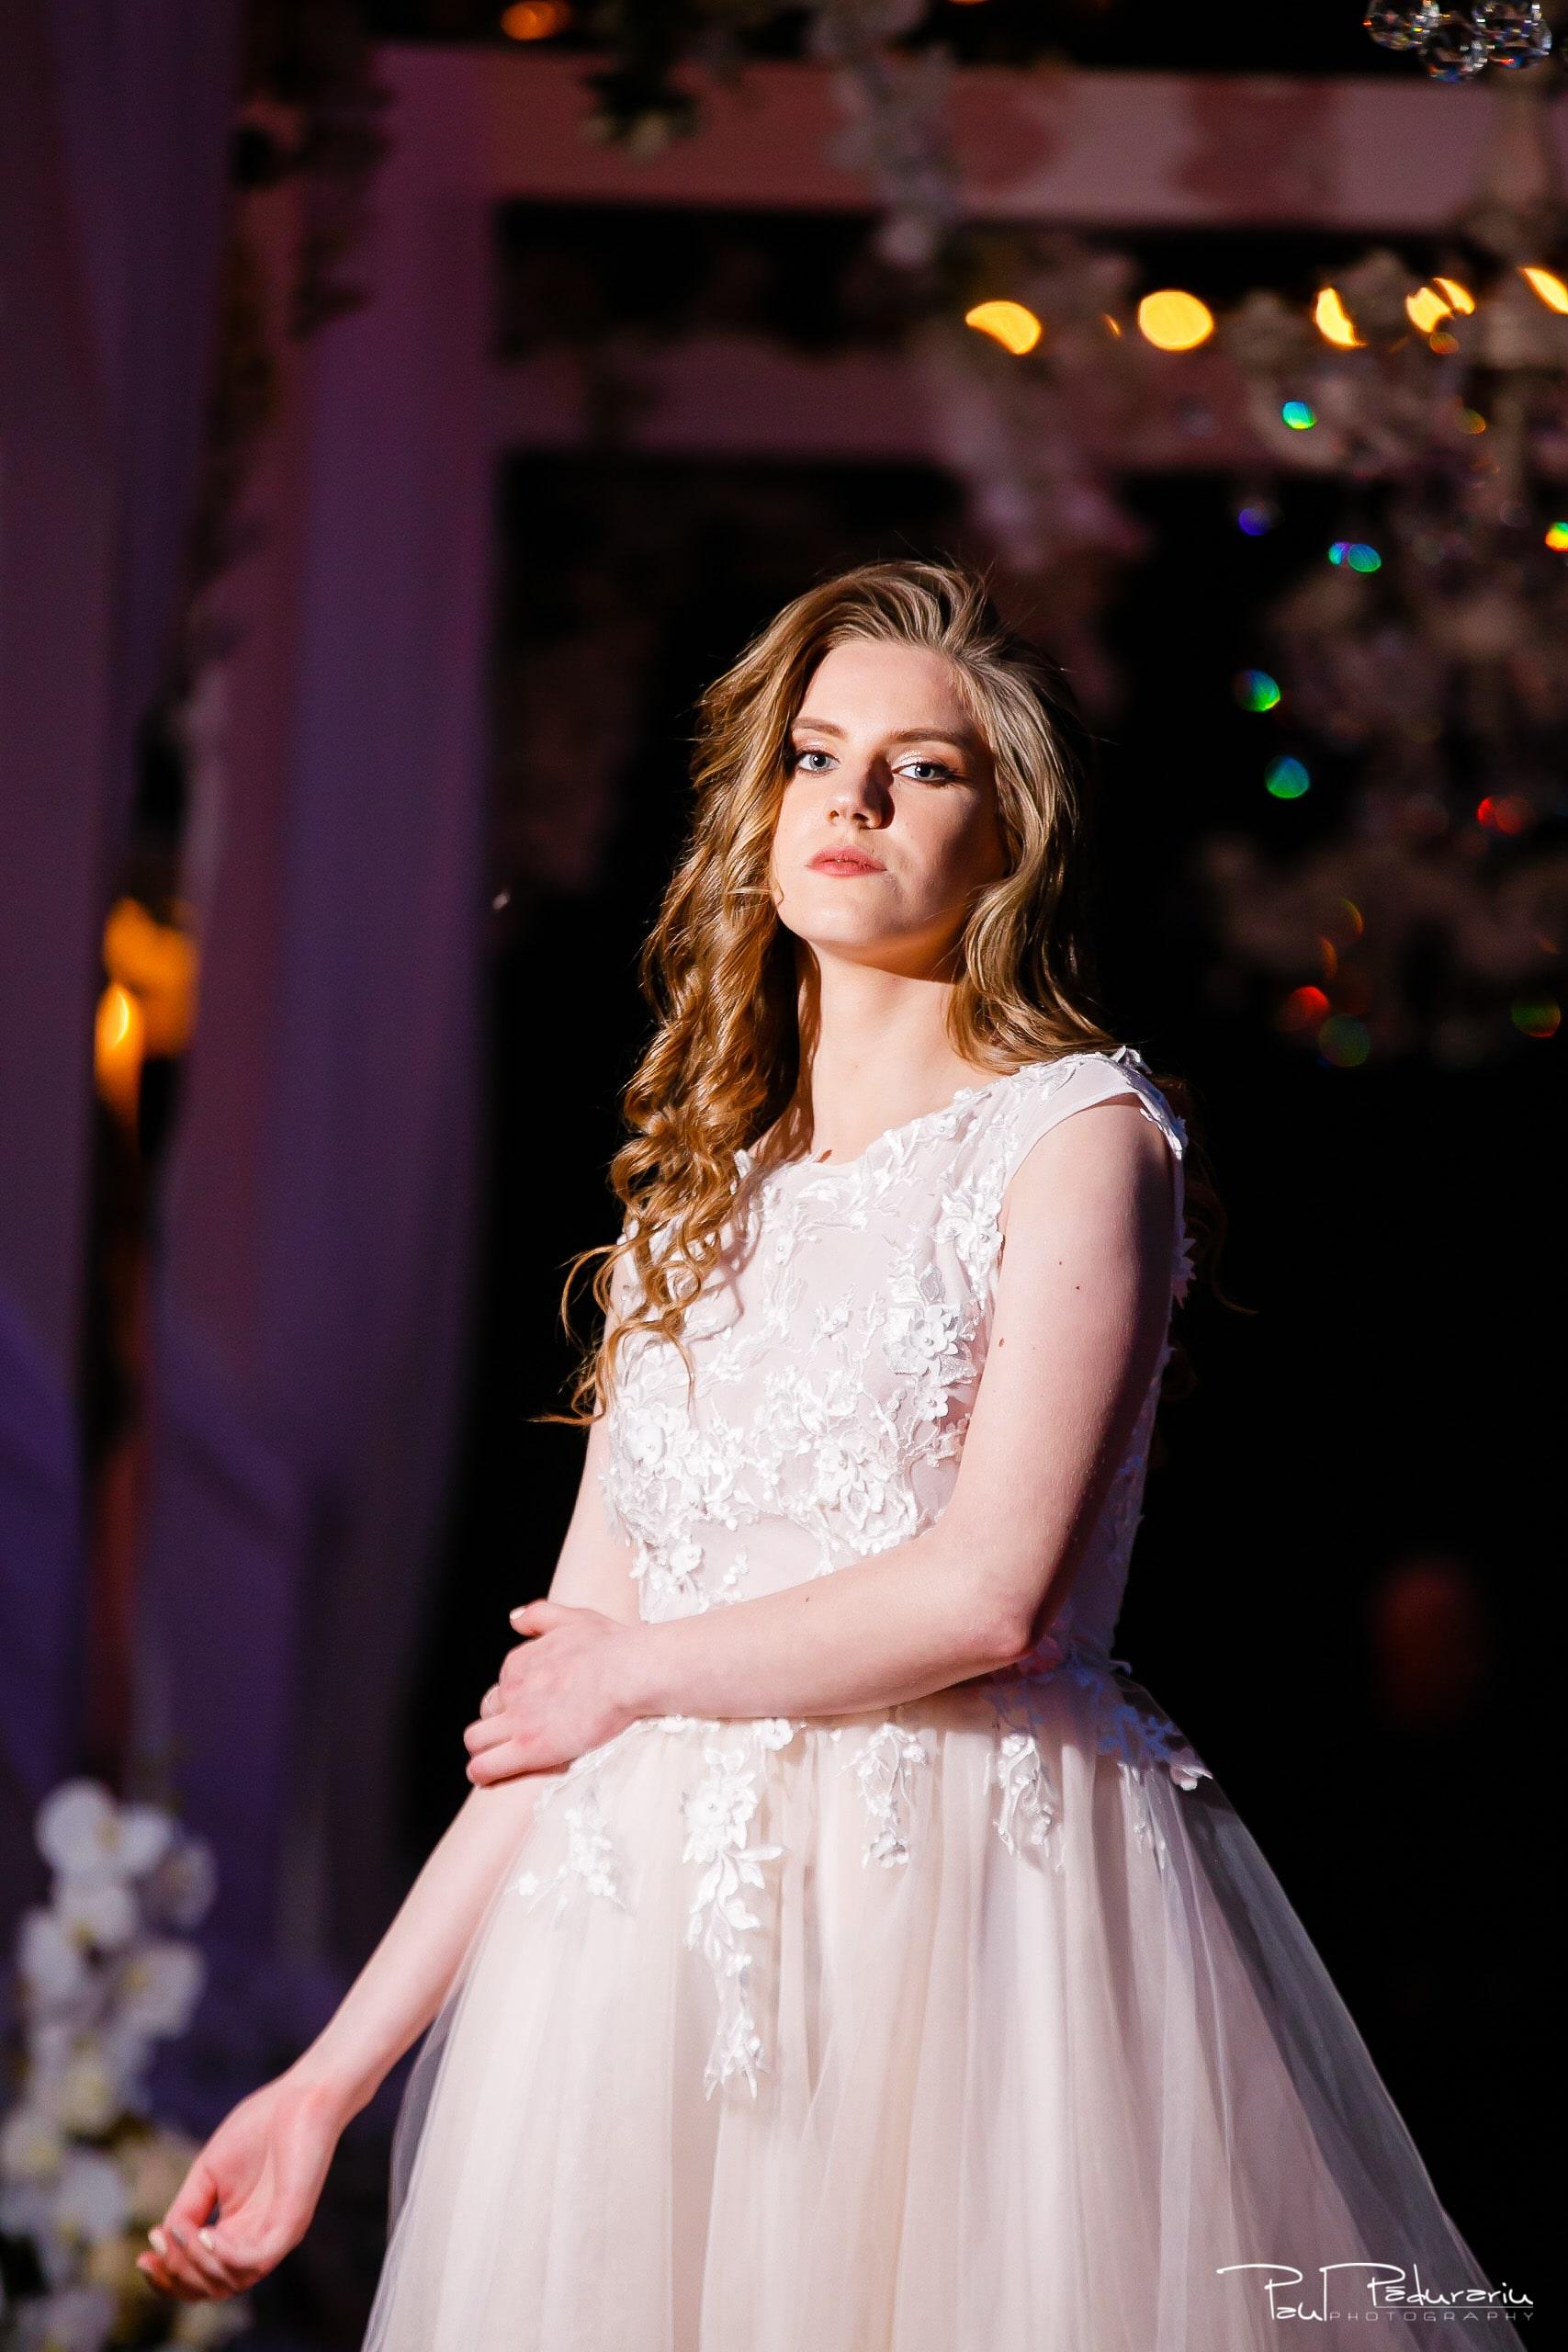 Modern Bride Edith Val colectie rochie mireasa 2019 - fotograf profesionist iasi paul padurariu | nunta iasi 23